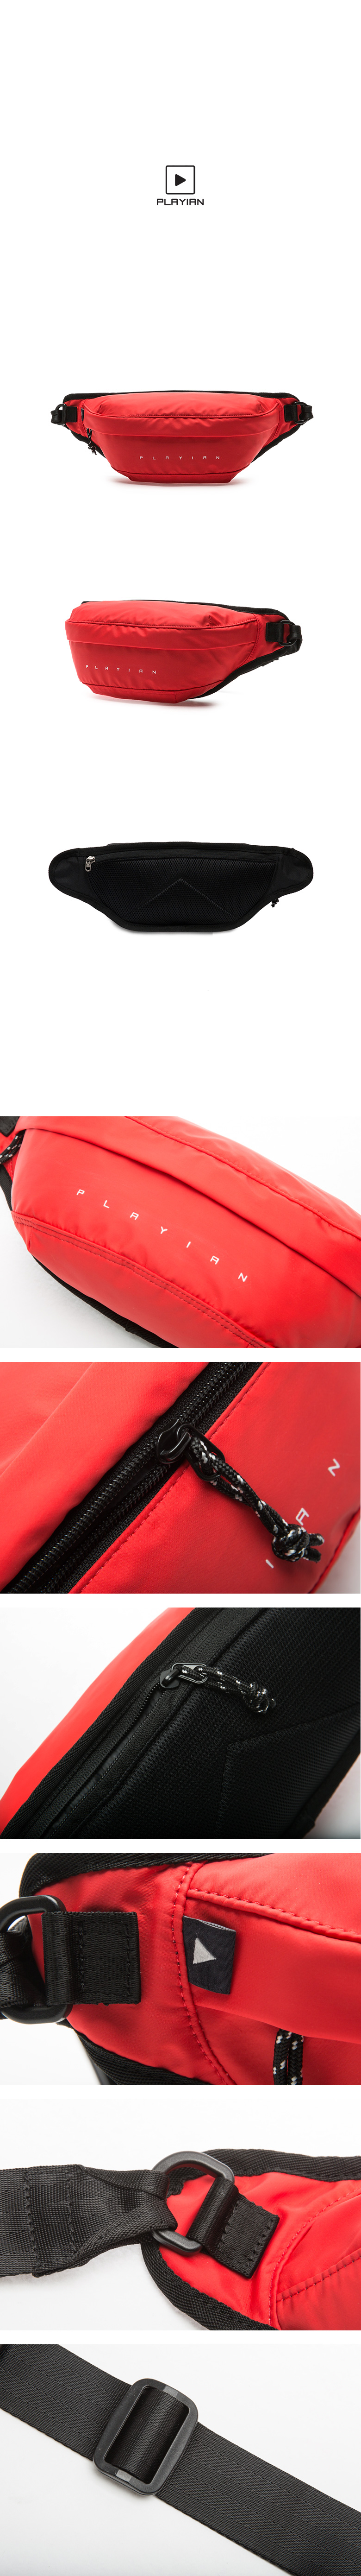 Inni waist bag_위니 웨이스트백(BW02URED)